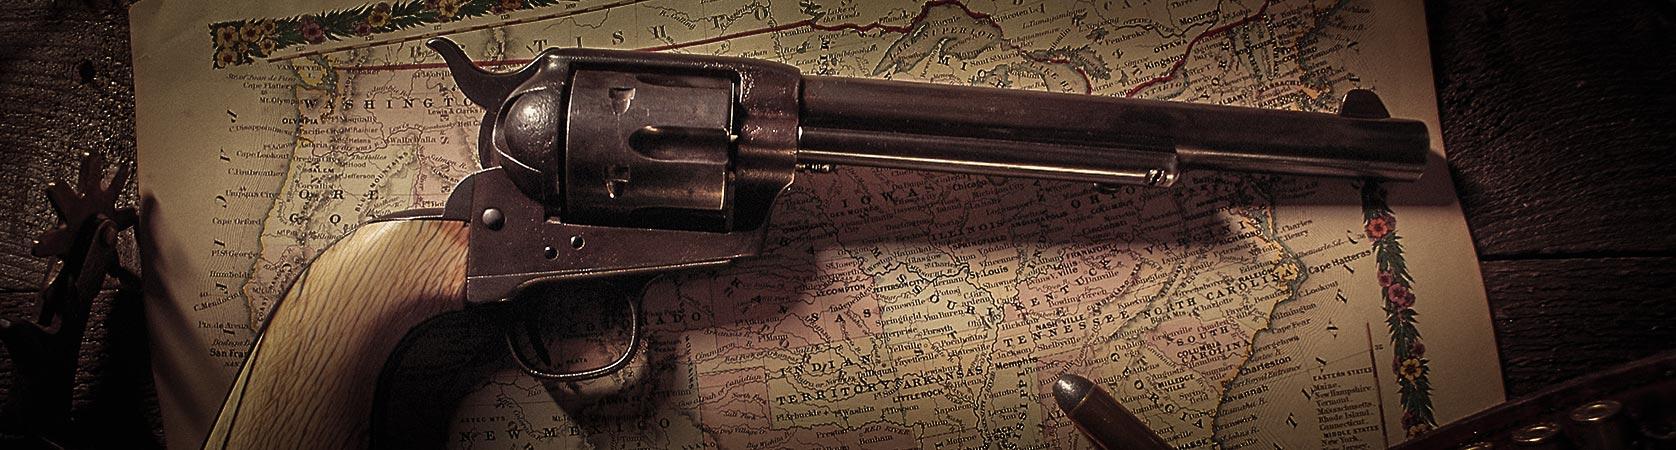 Cowboy Action Shooting